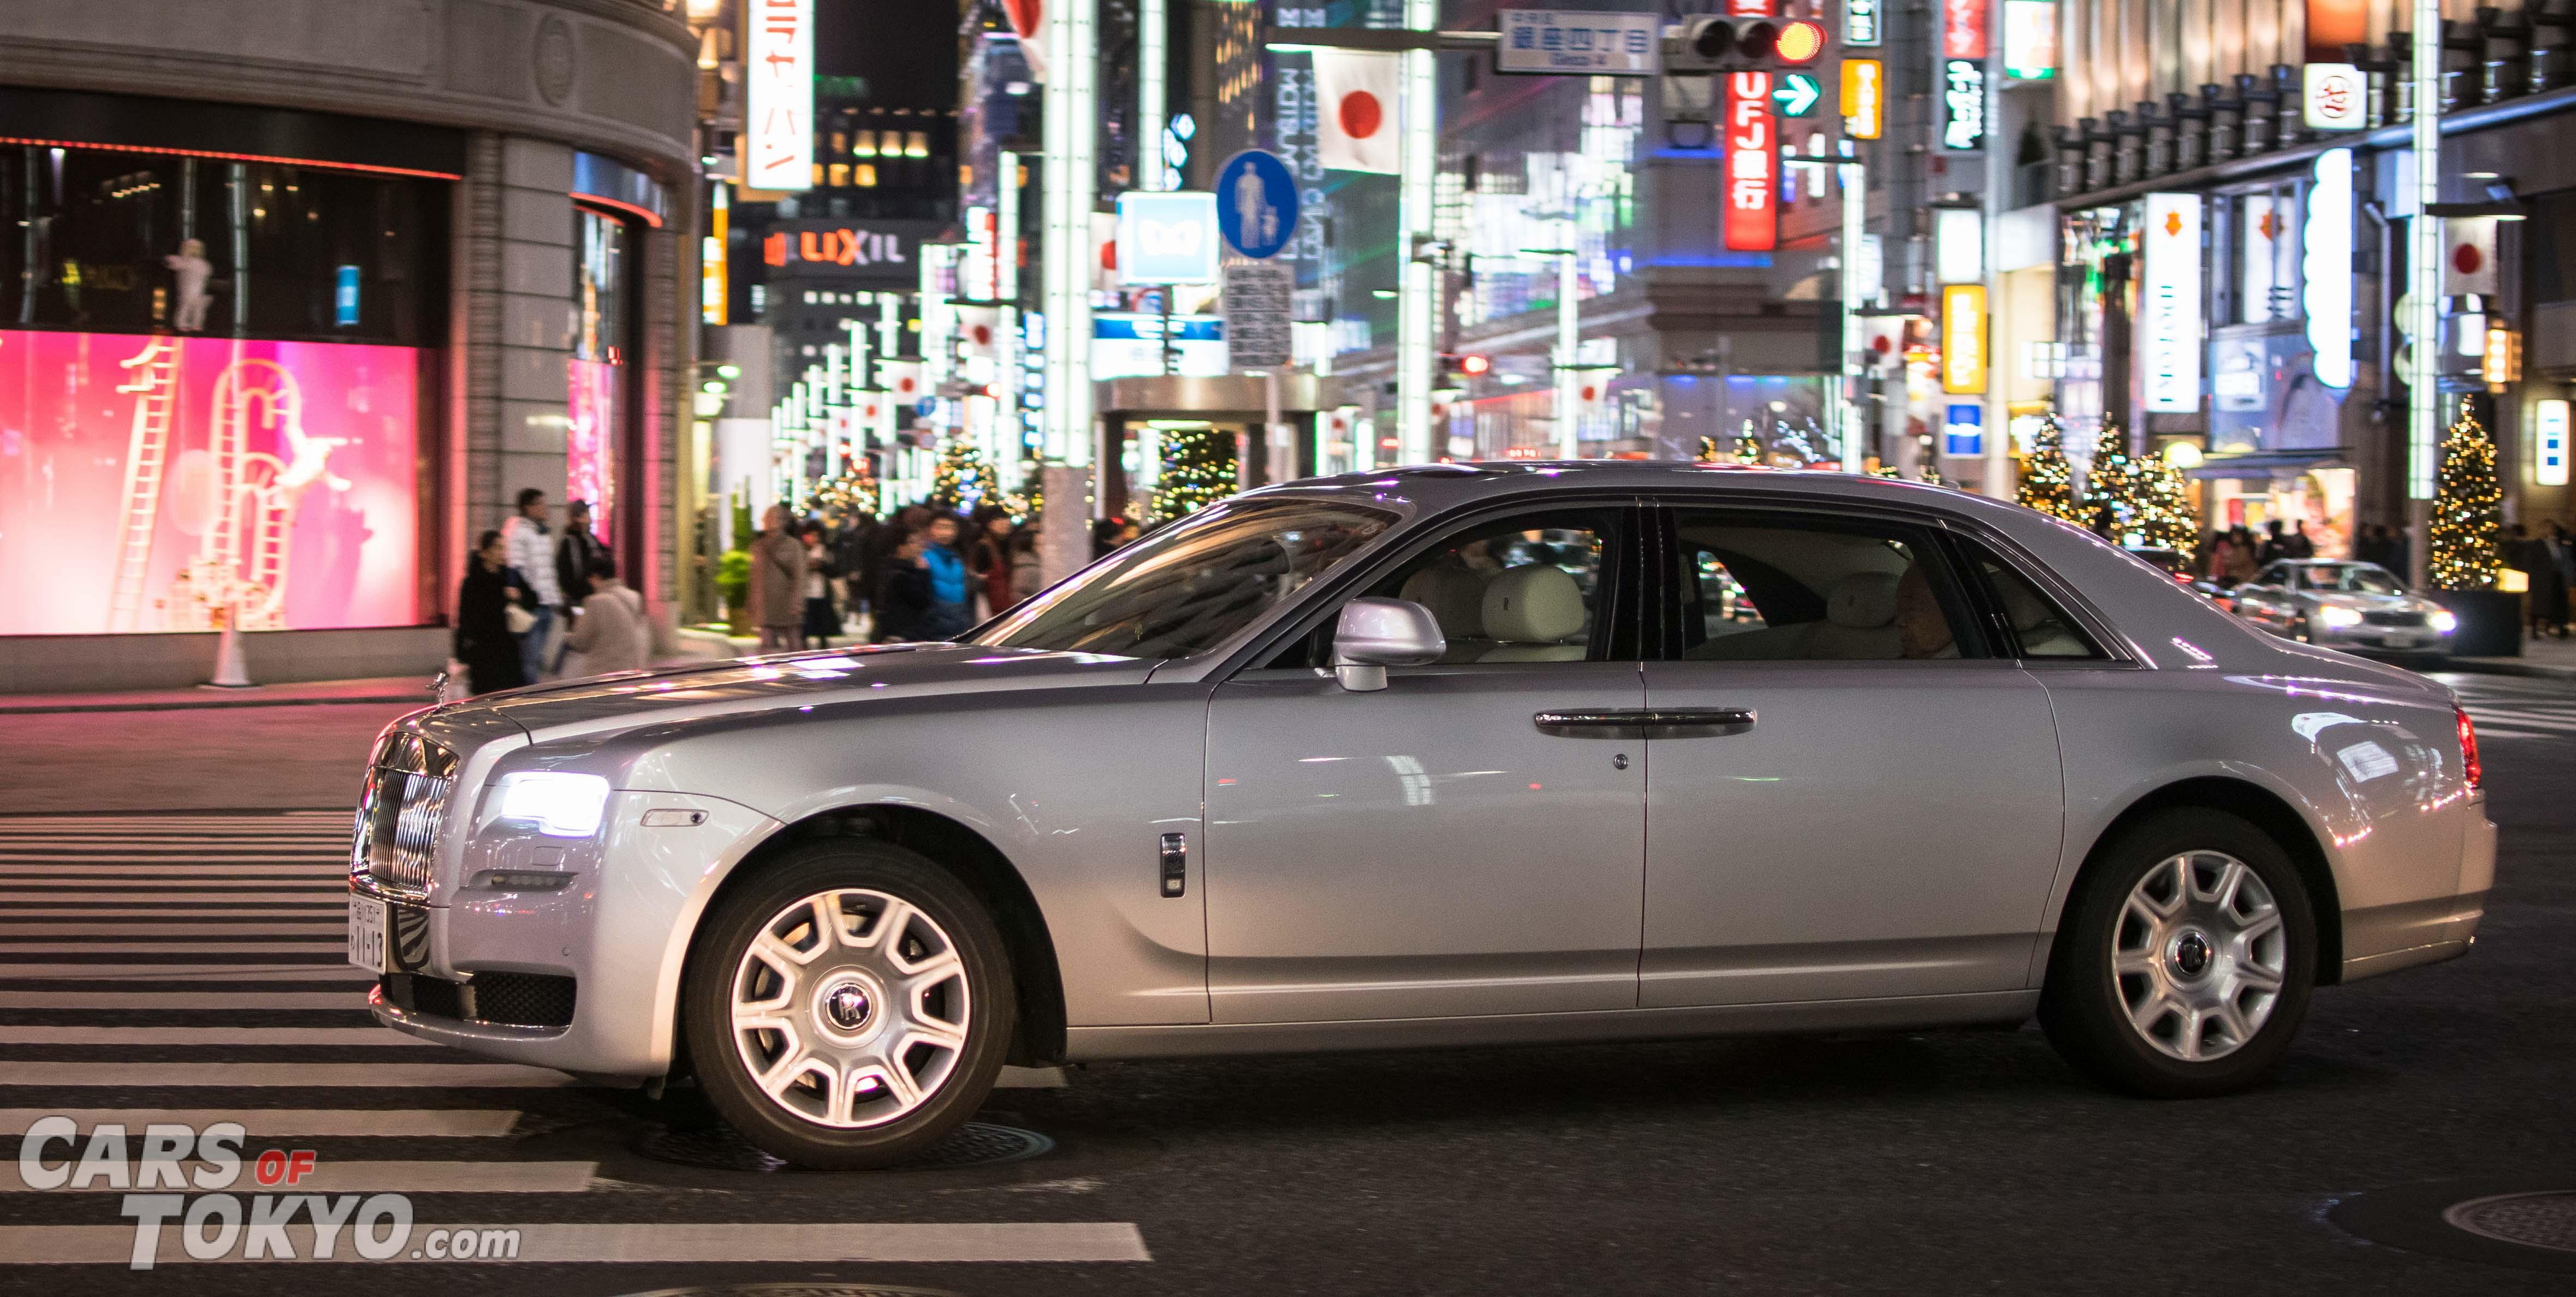 cars-of-tokyo-luxury-rolls-royce-ghost-ewb